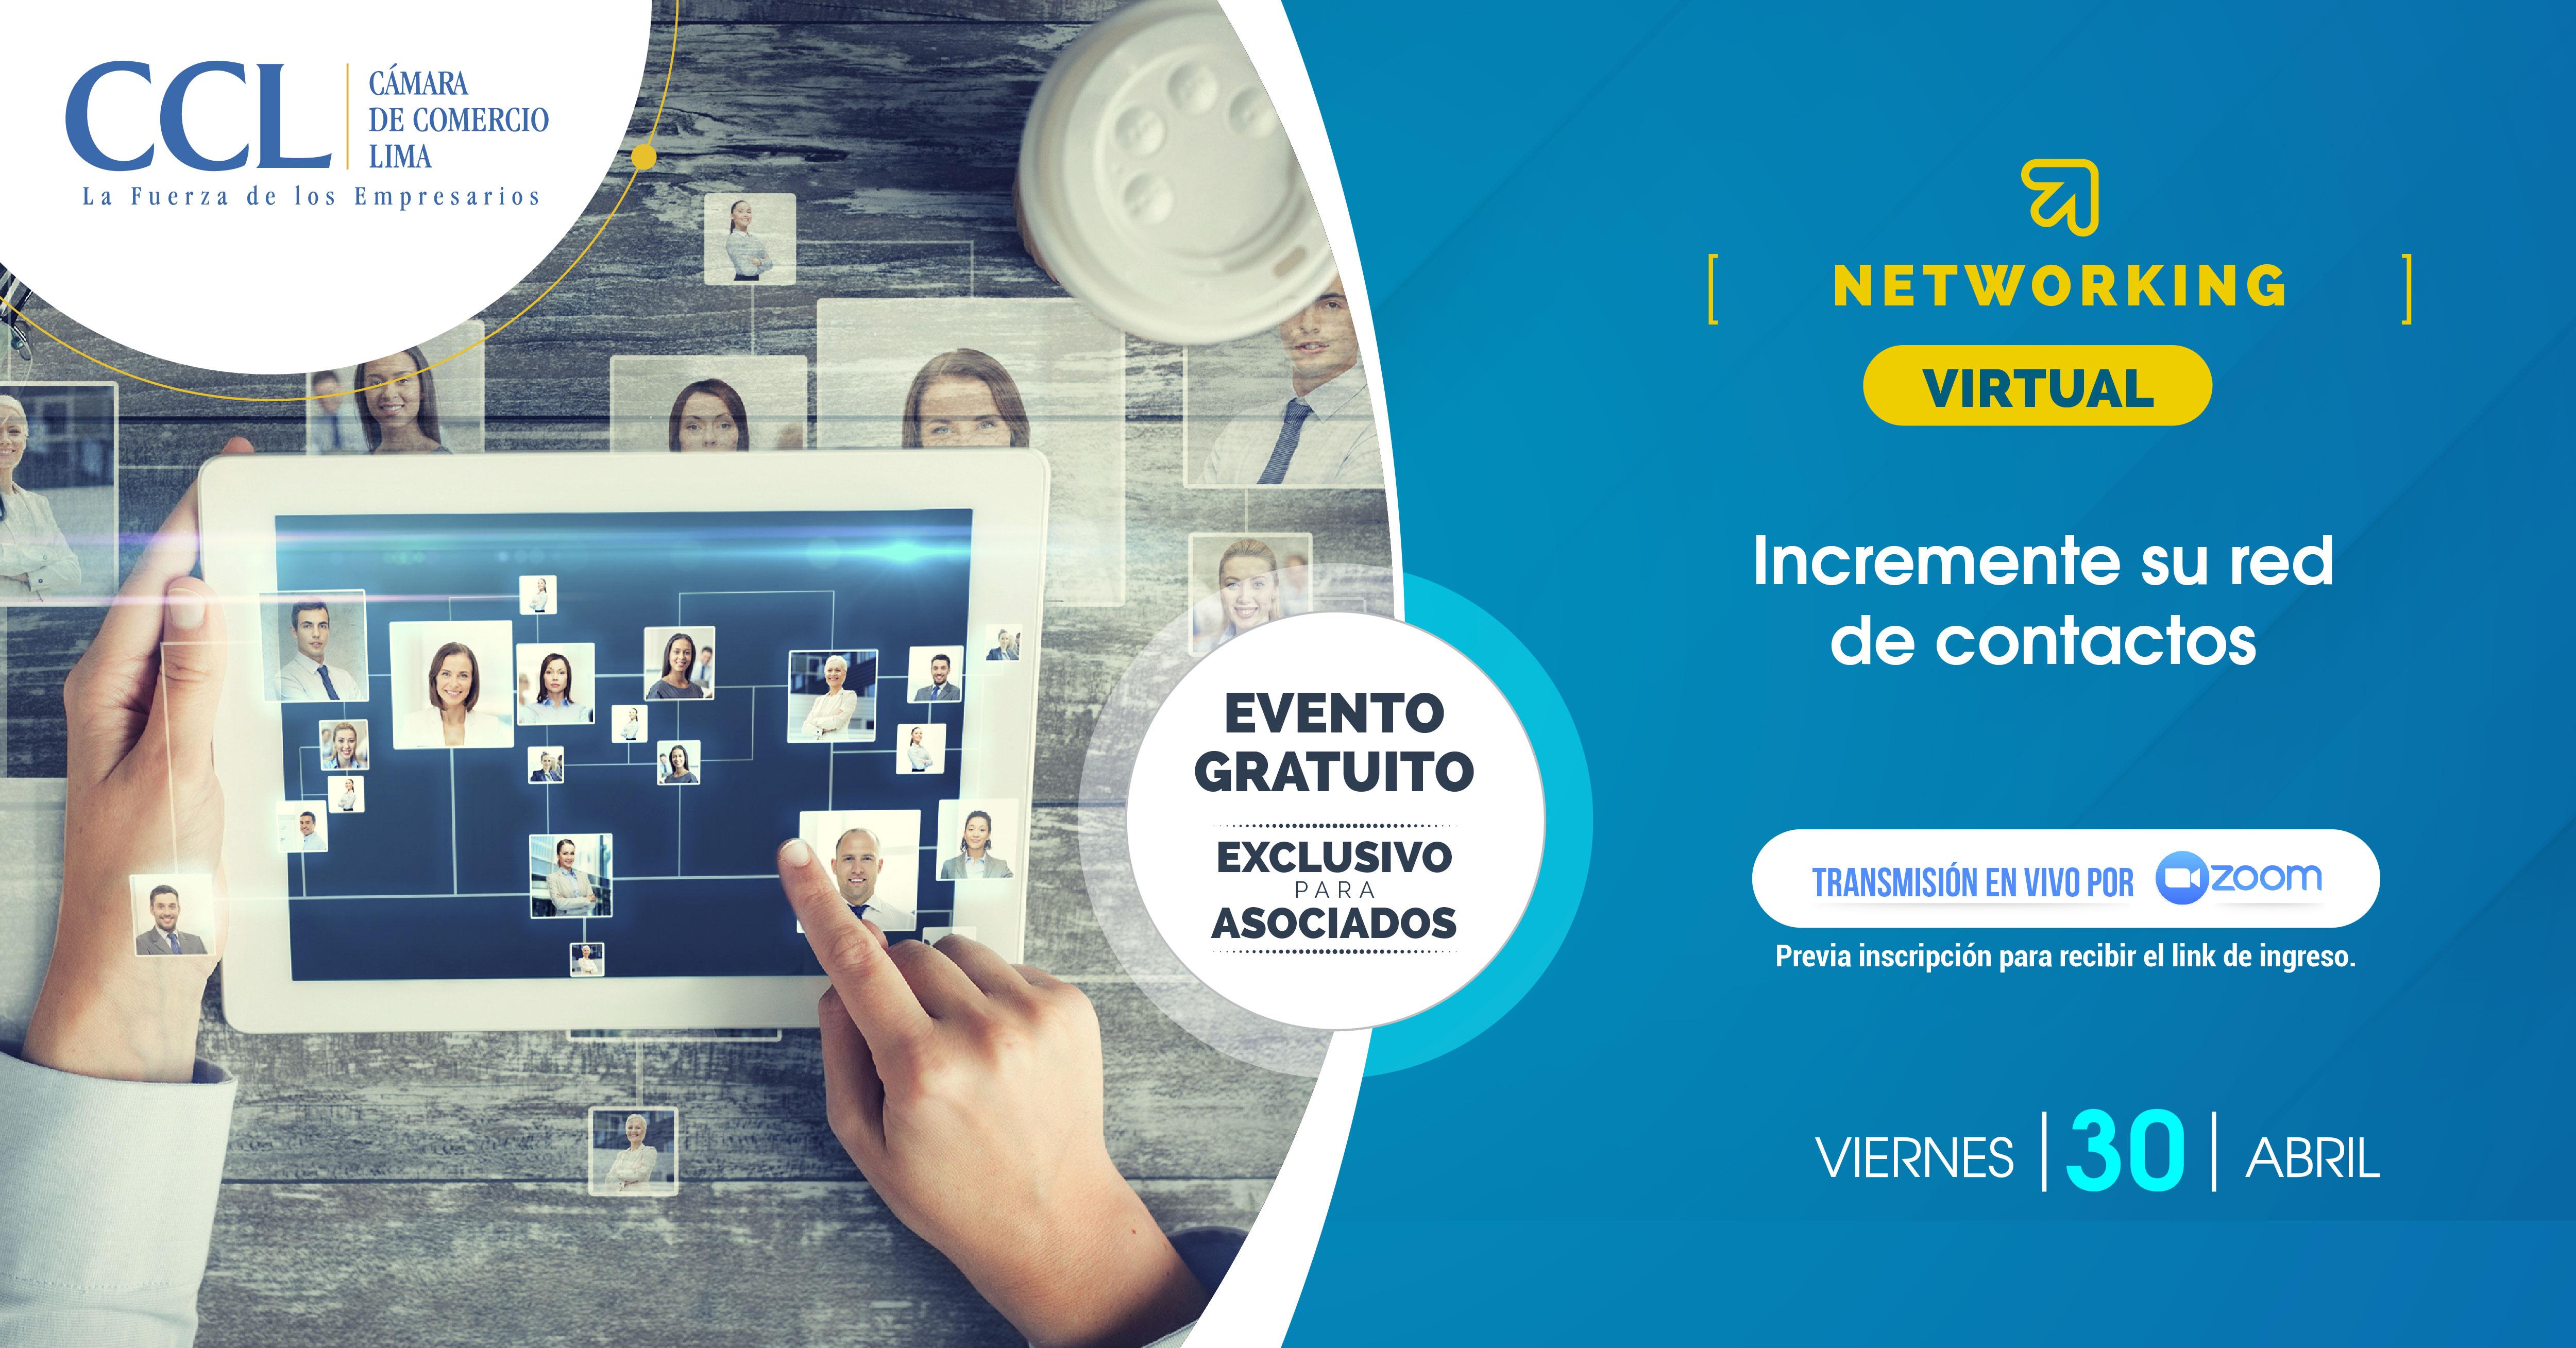 NETWORKING VIRTUAL 30.04.21